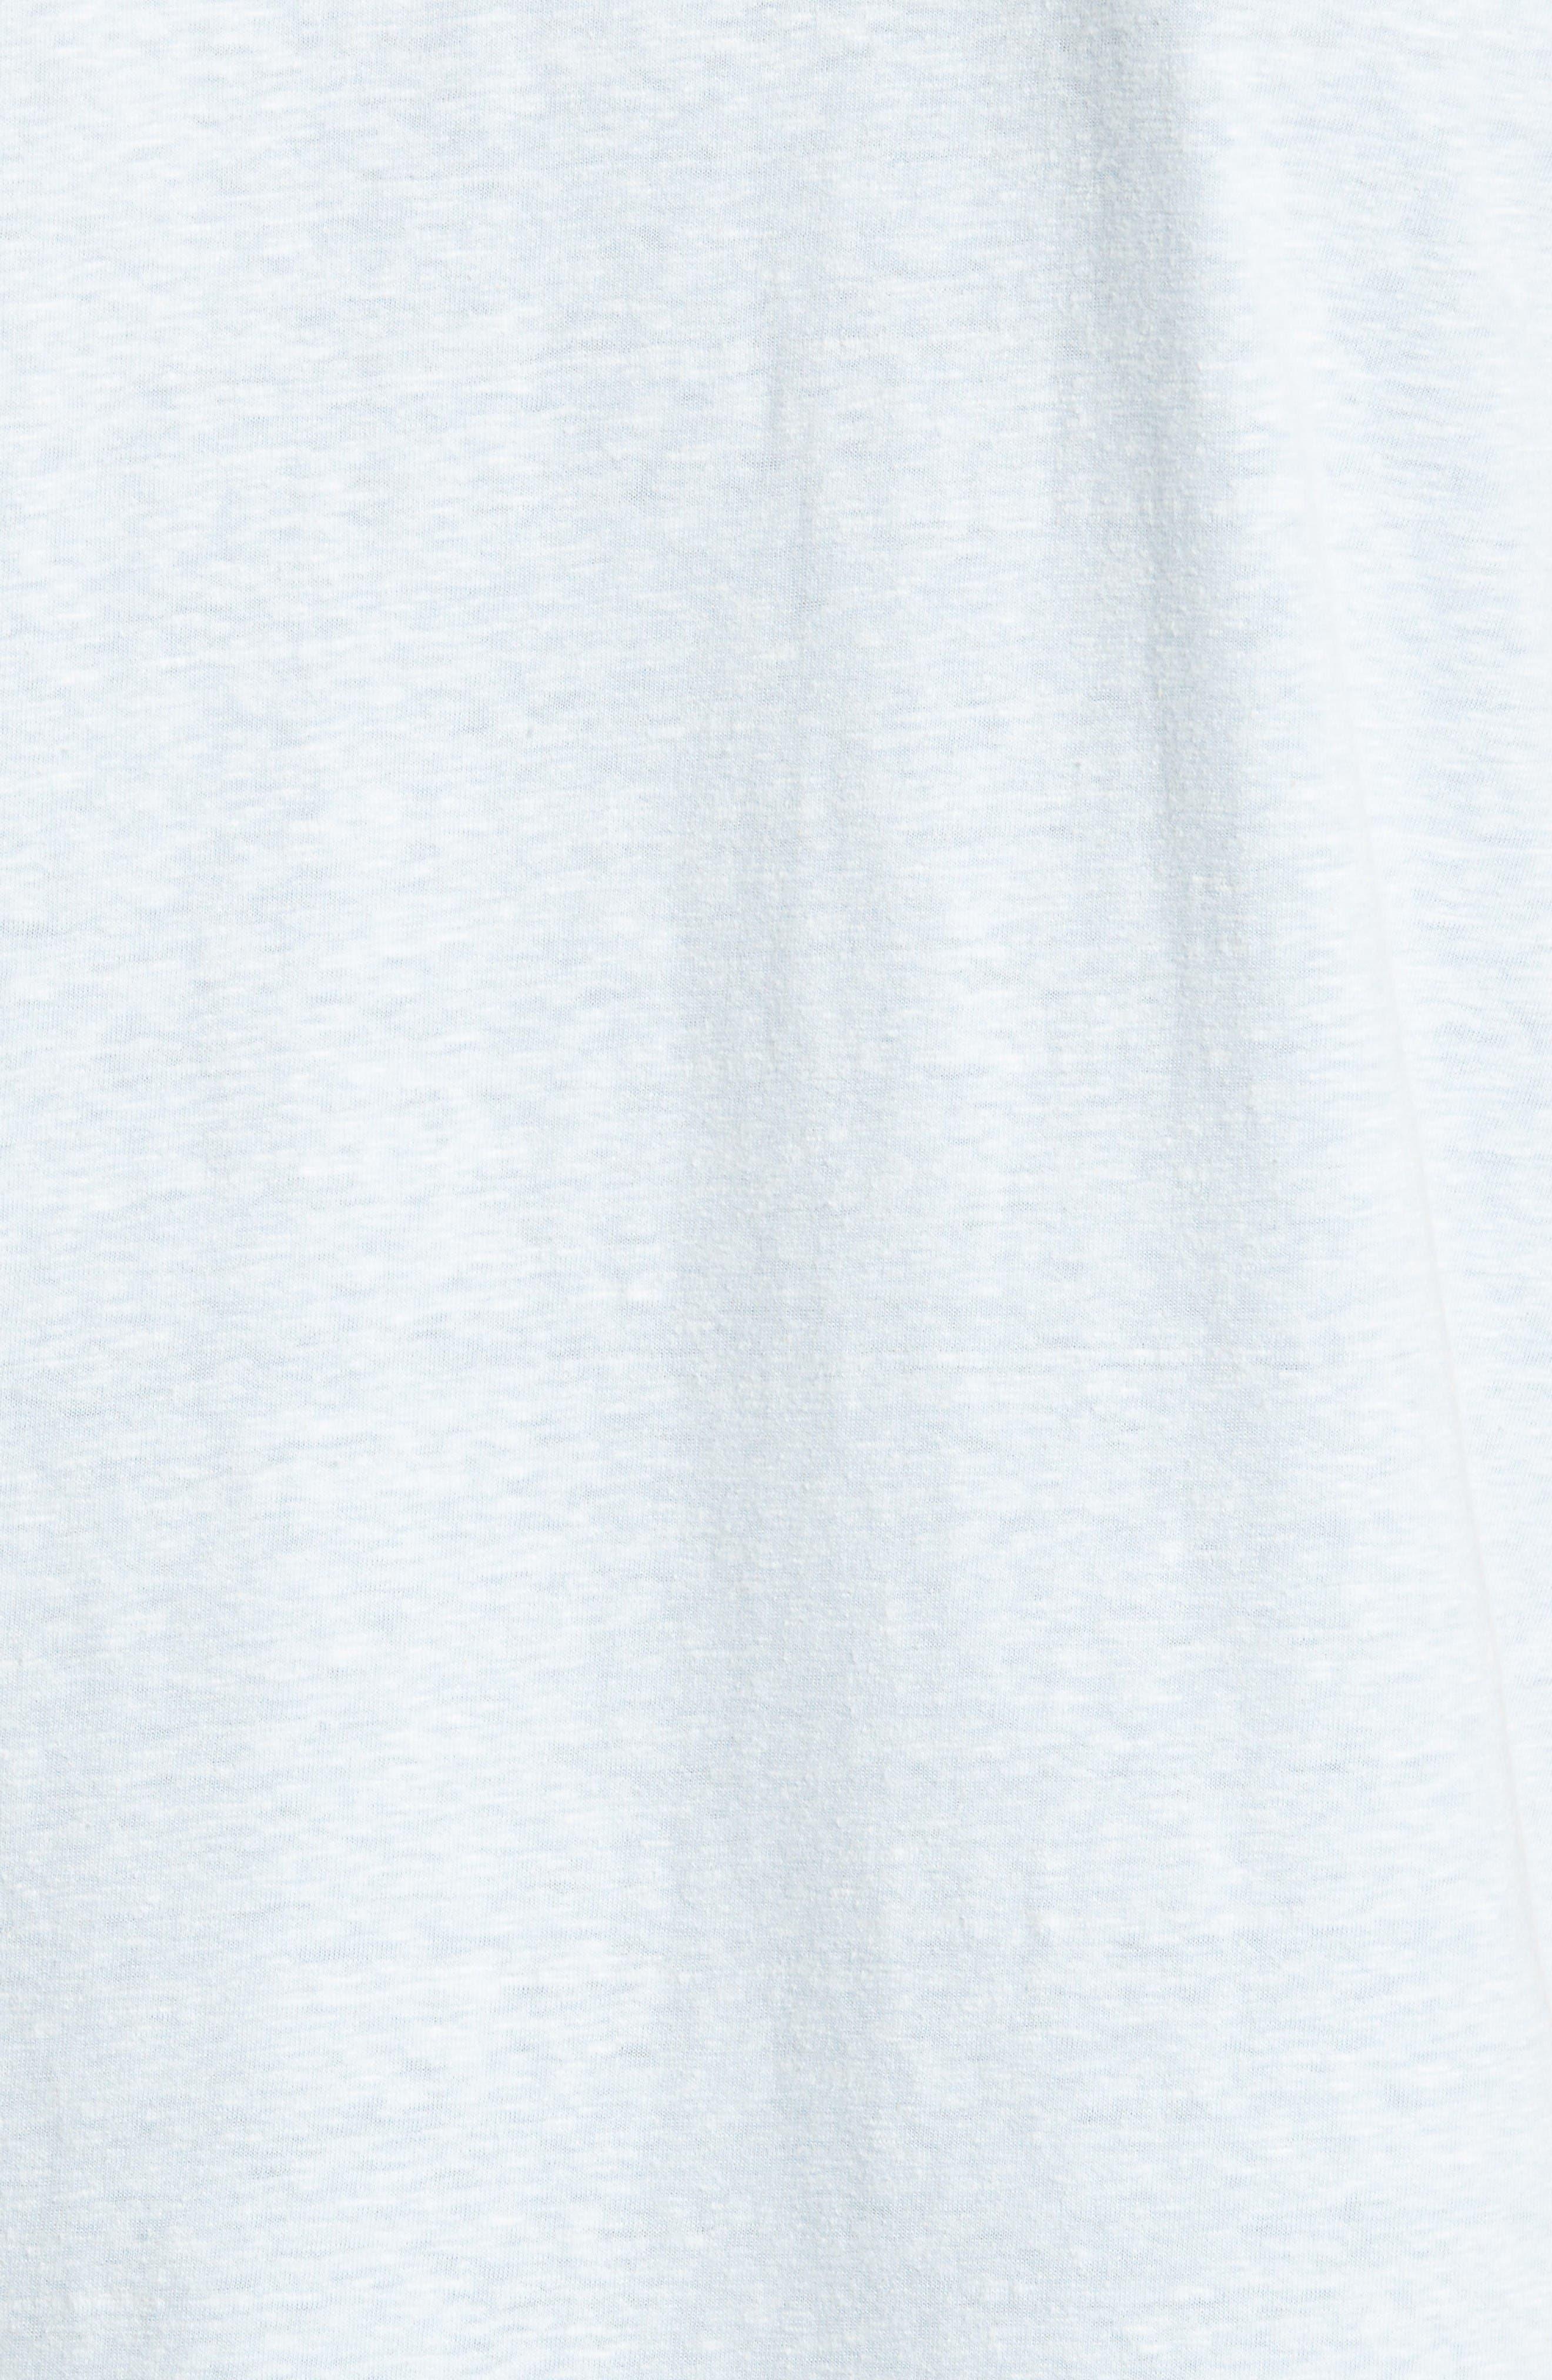 Jimmy T-Shirt,                             Alternate thumbnail 5, color,                             Blue